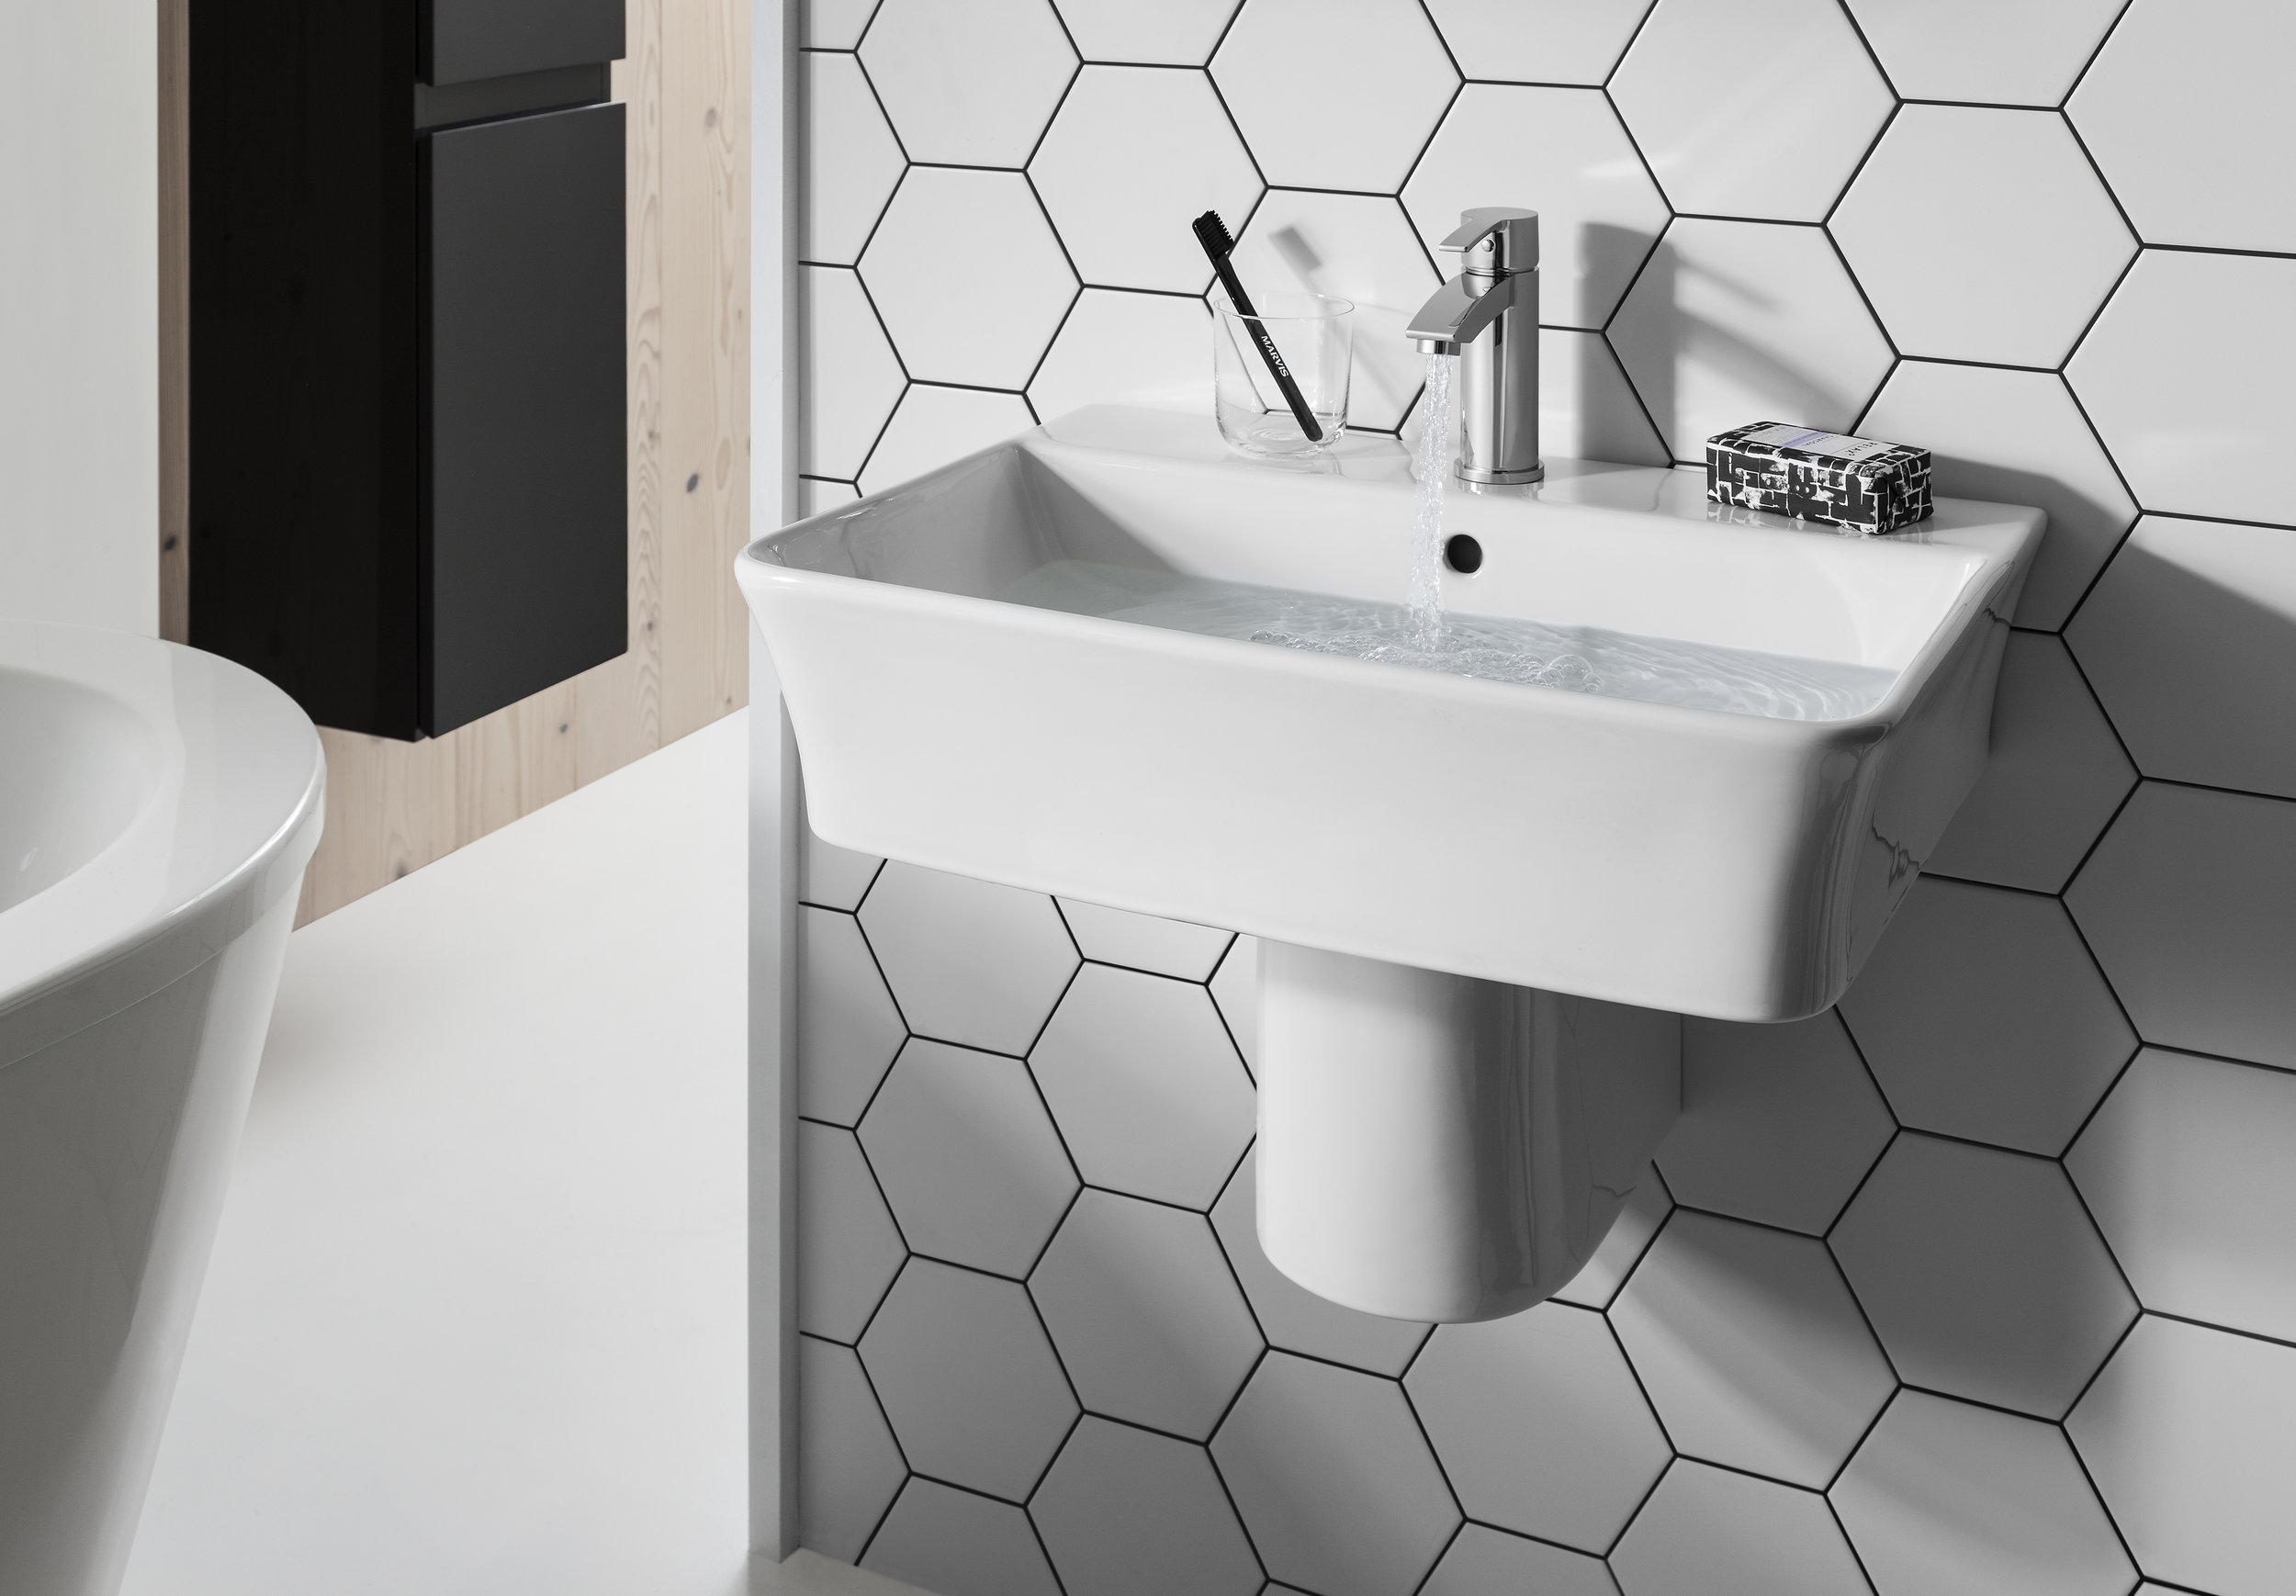 6. Keeping it elegant - This semi pedestal washbasin from Britton Bathrooms is perfect for a creating a modern, minimalist bathroom.